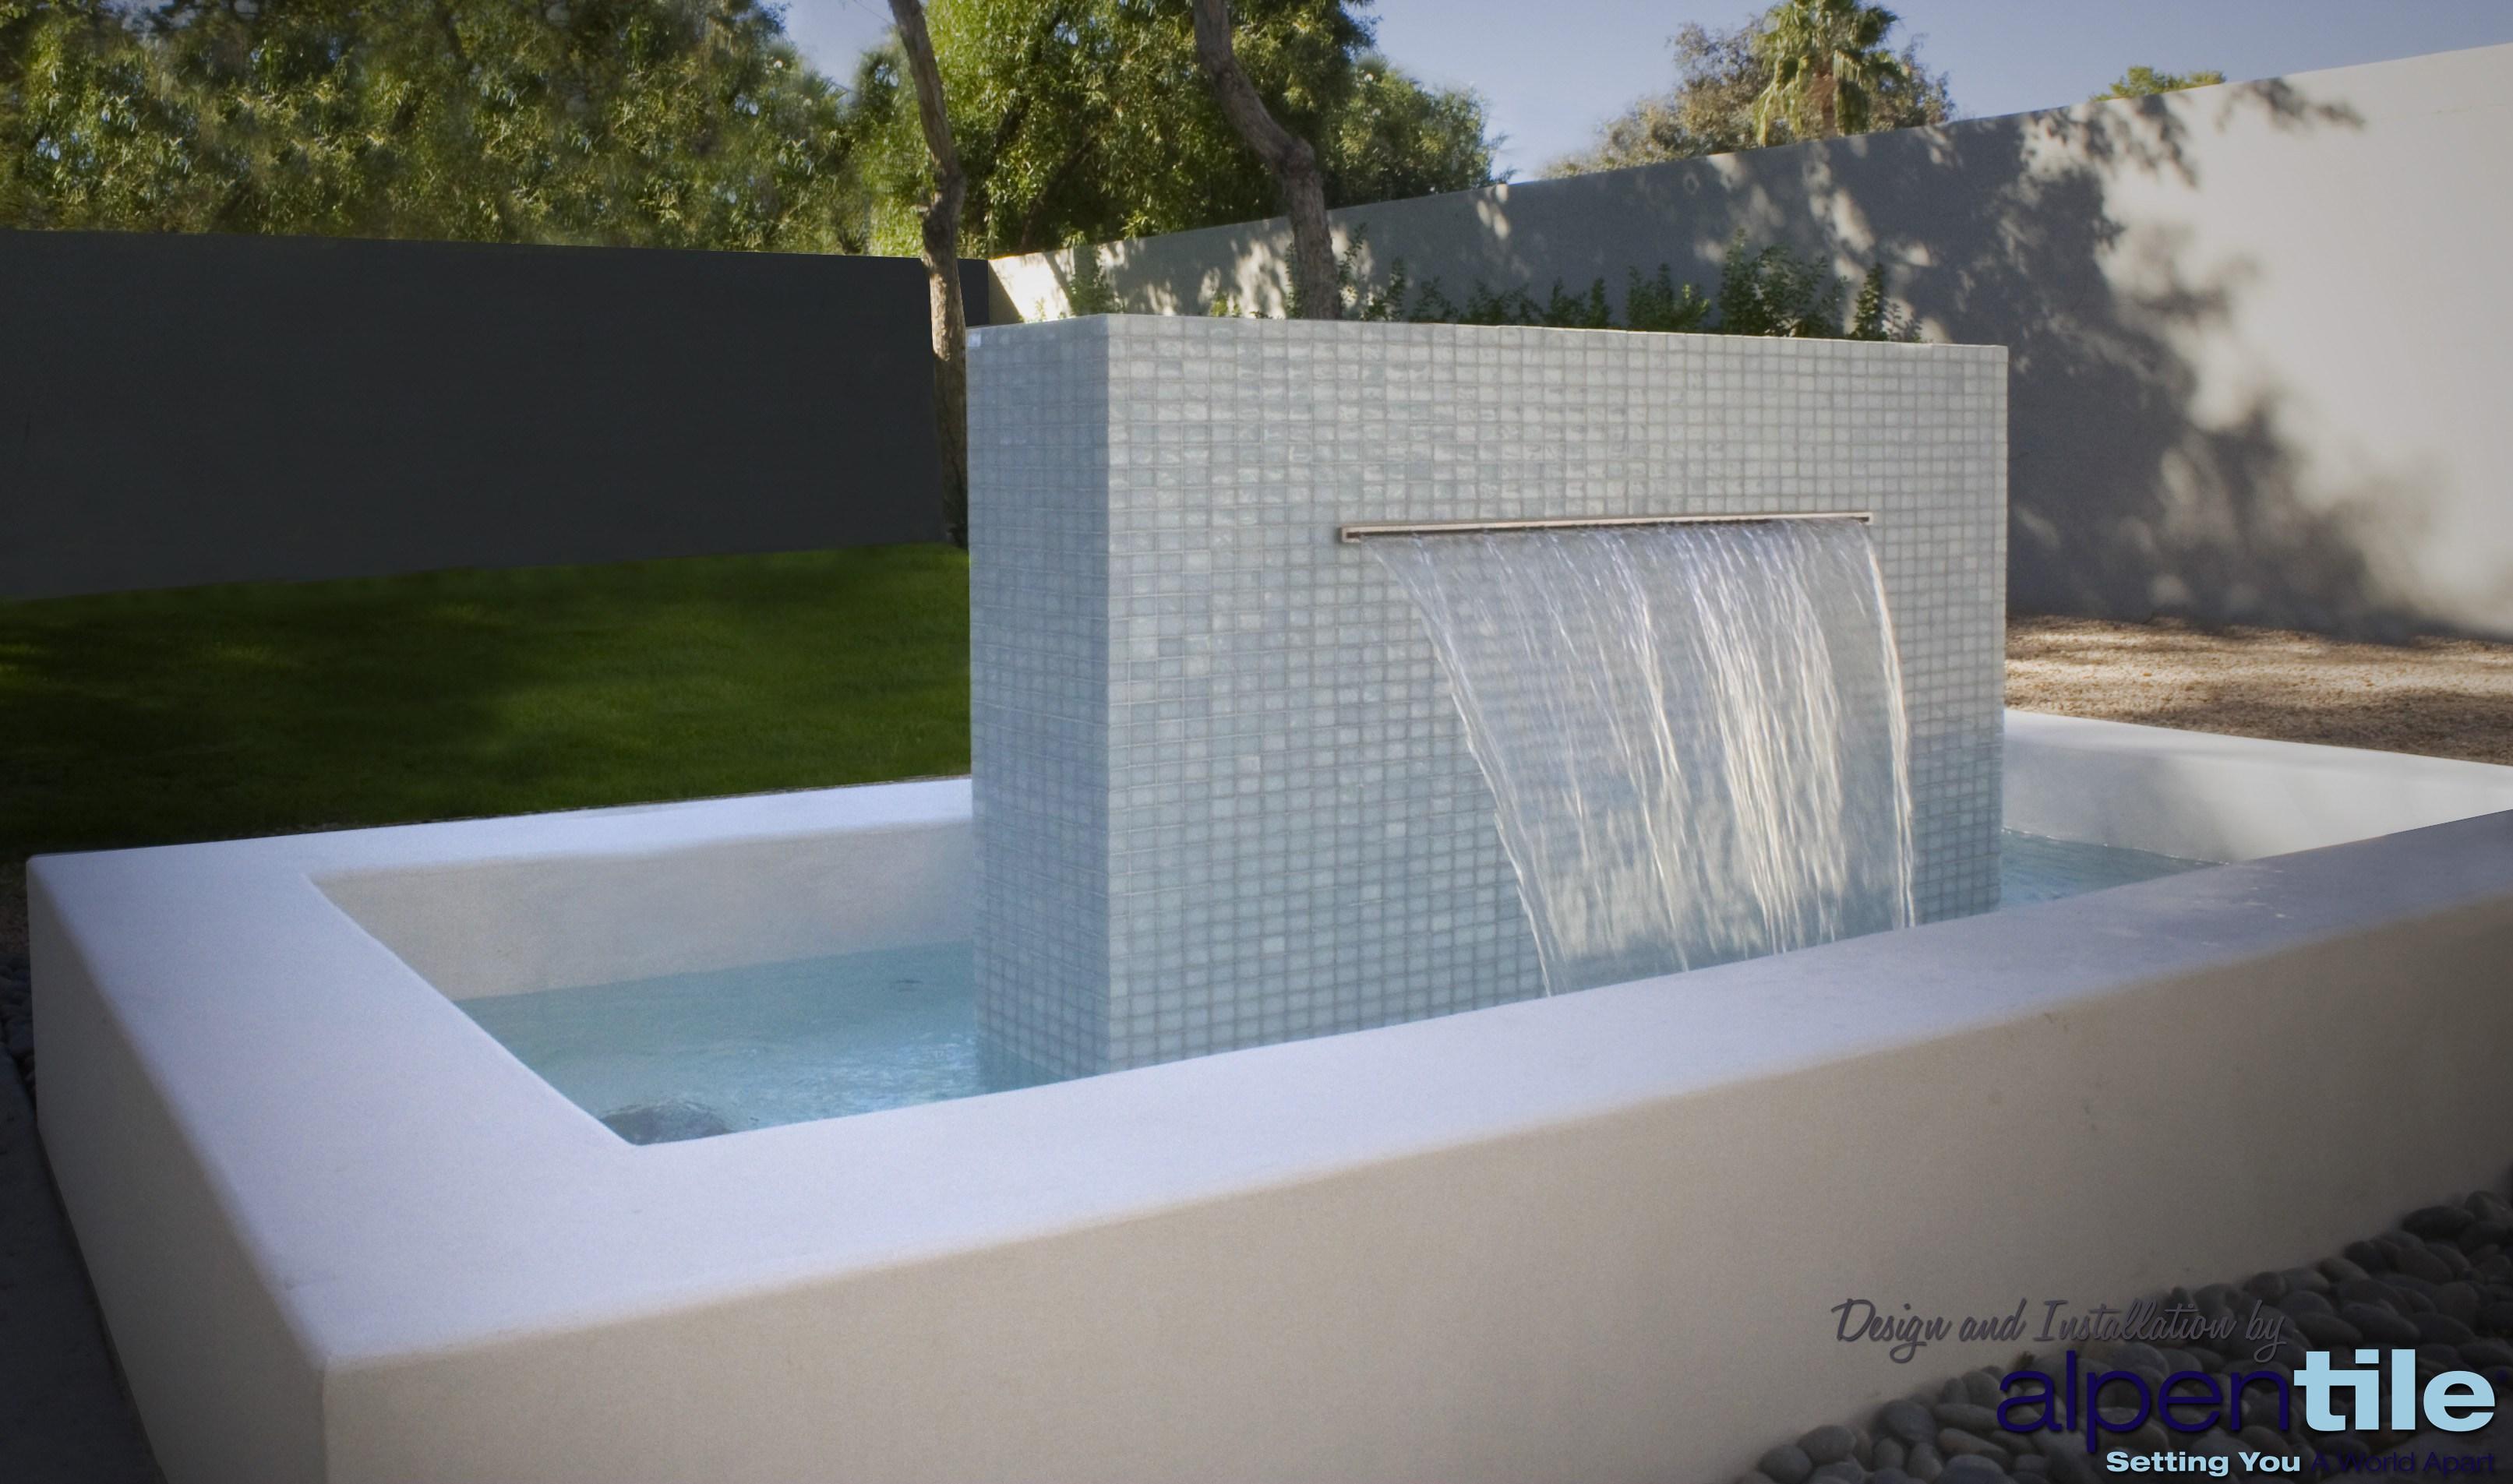 Fountain of tiles photo